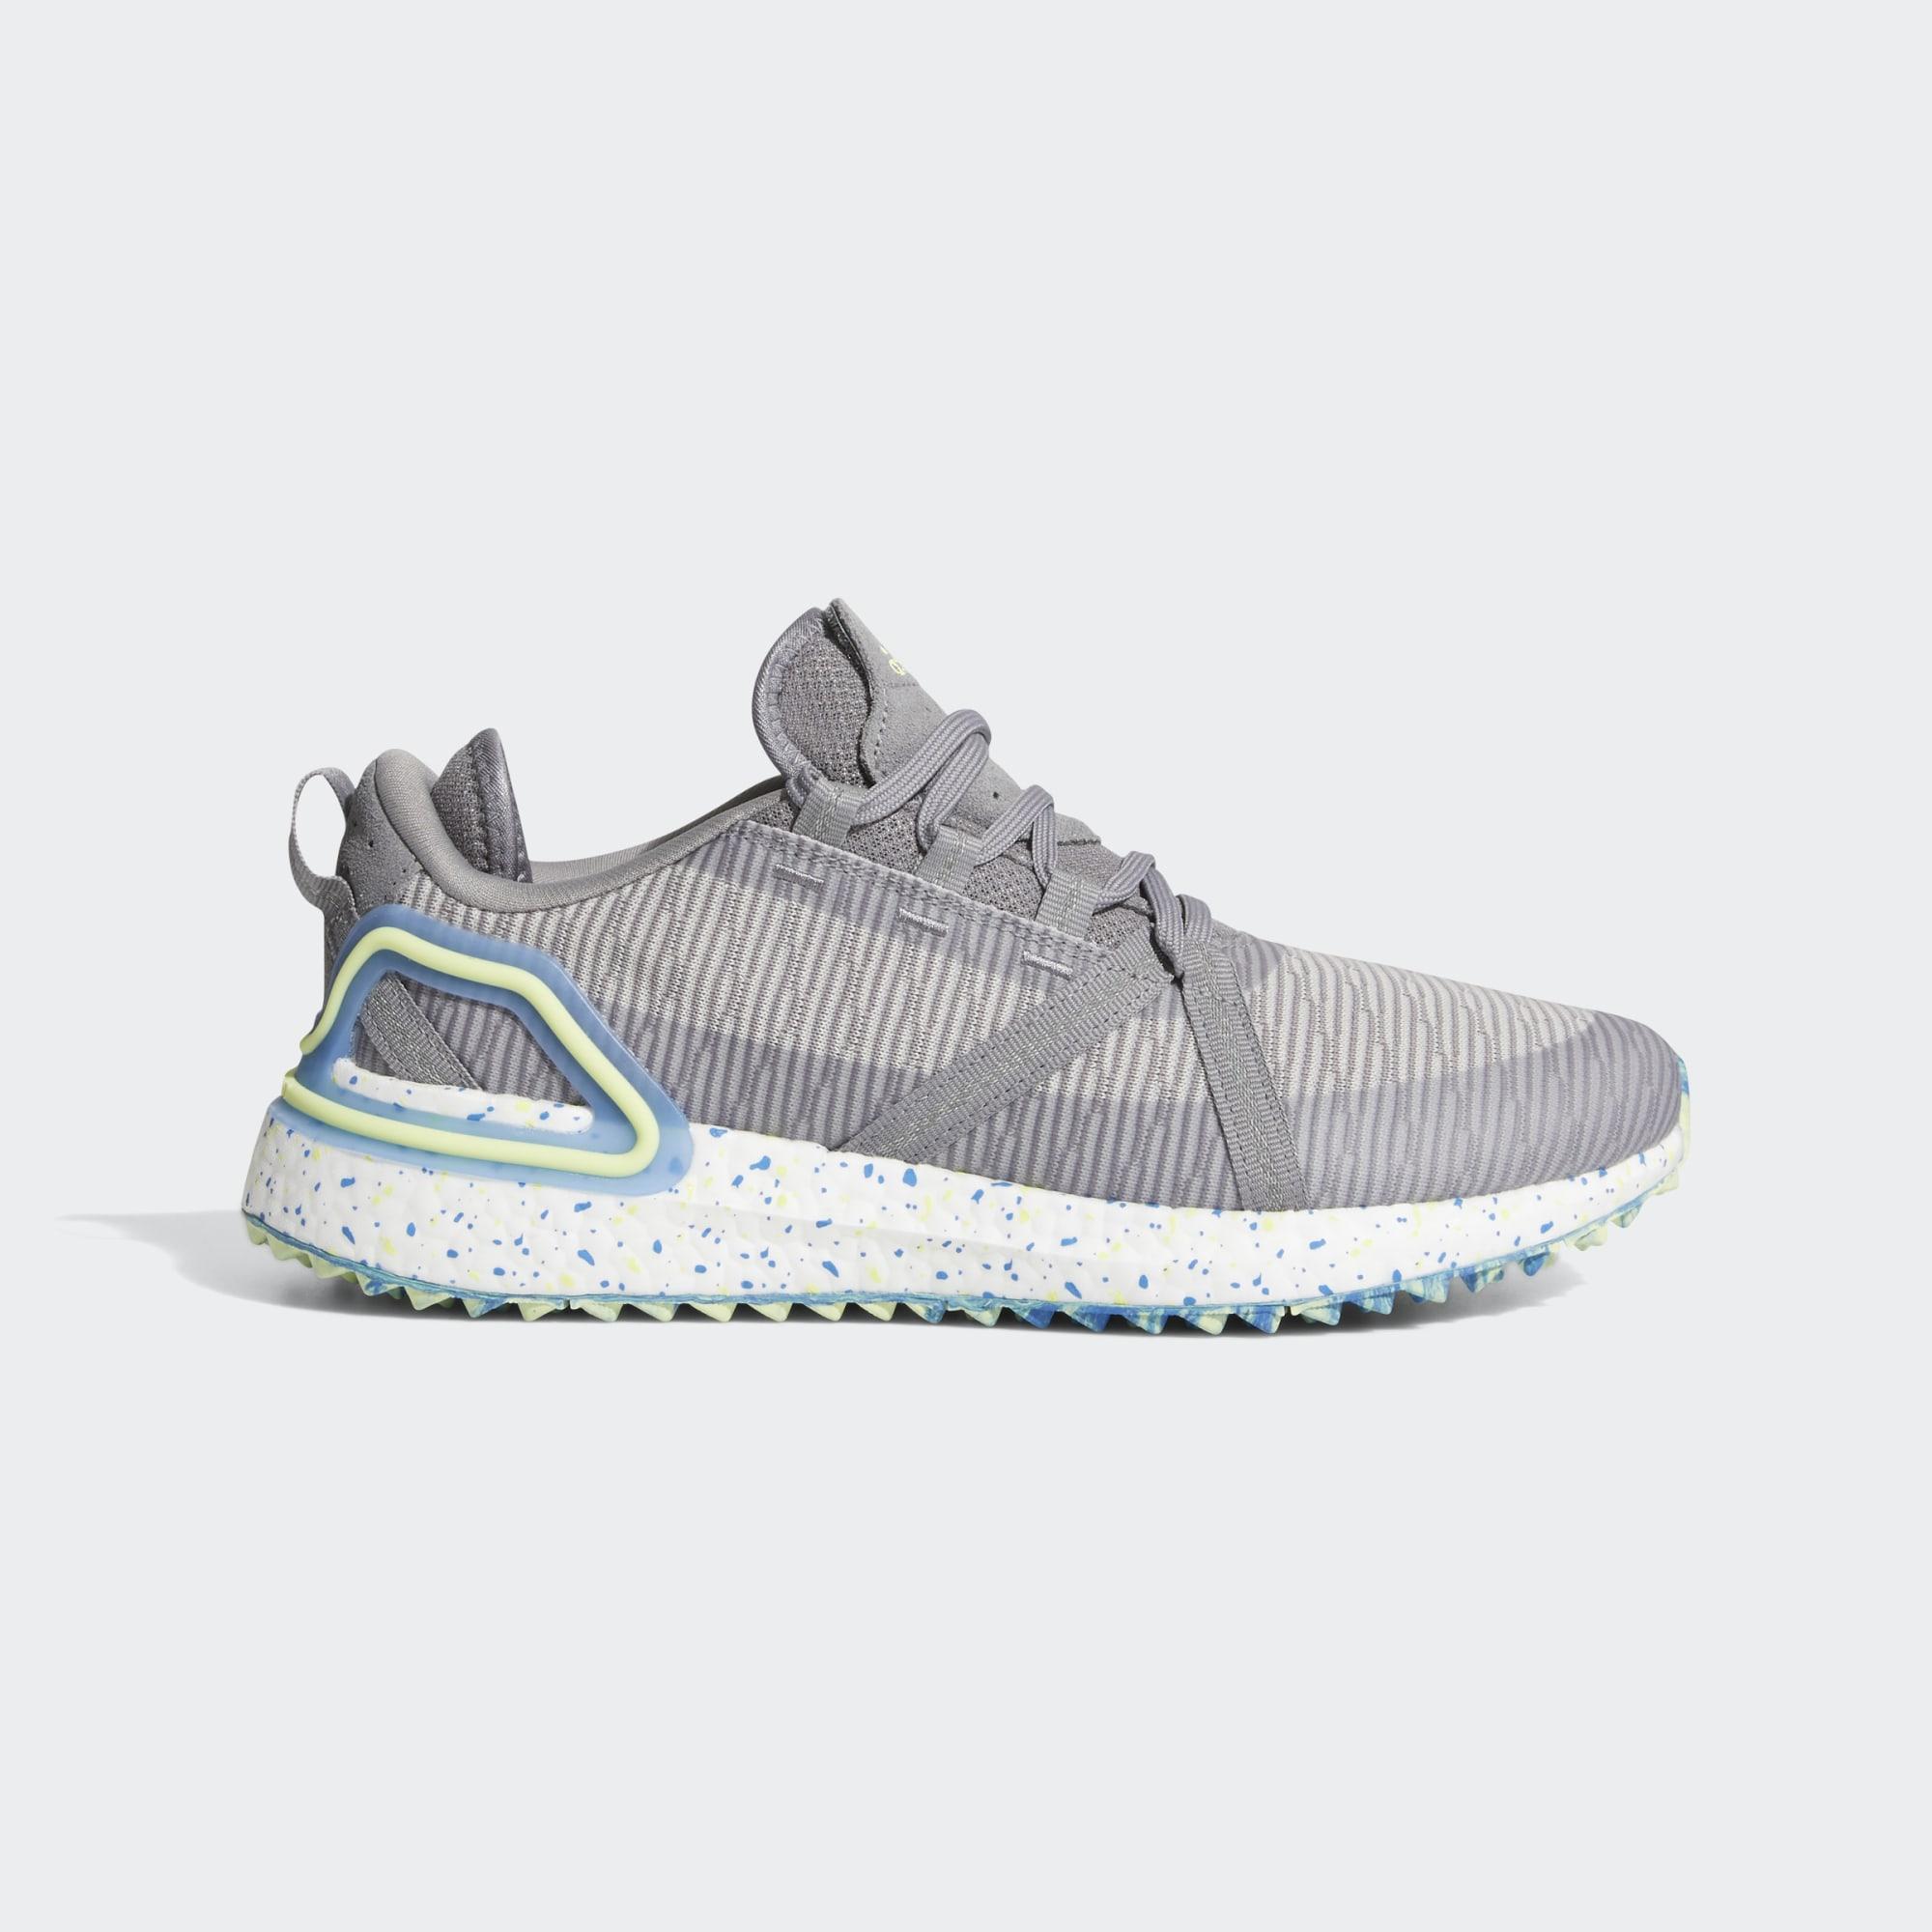 Adidas Men's Solarthon Primegreen Spikeless Golf Shoes - Grey Three/Pulse Yellow